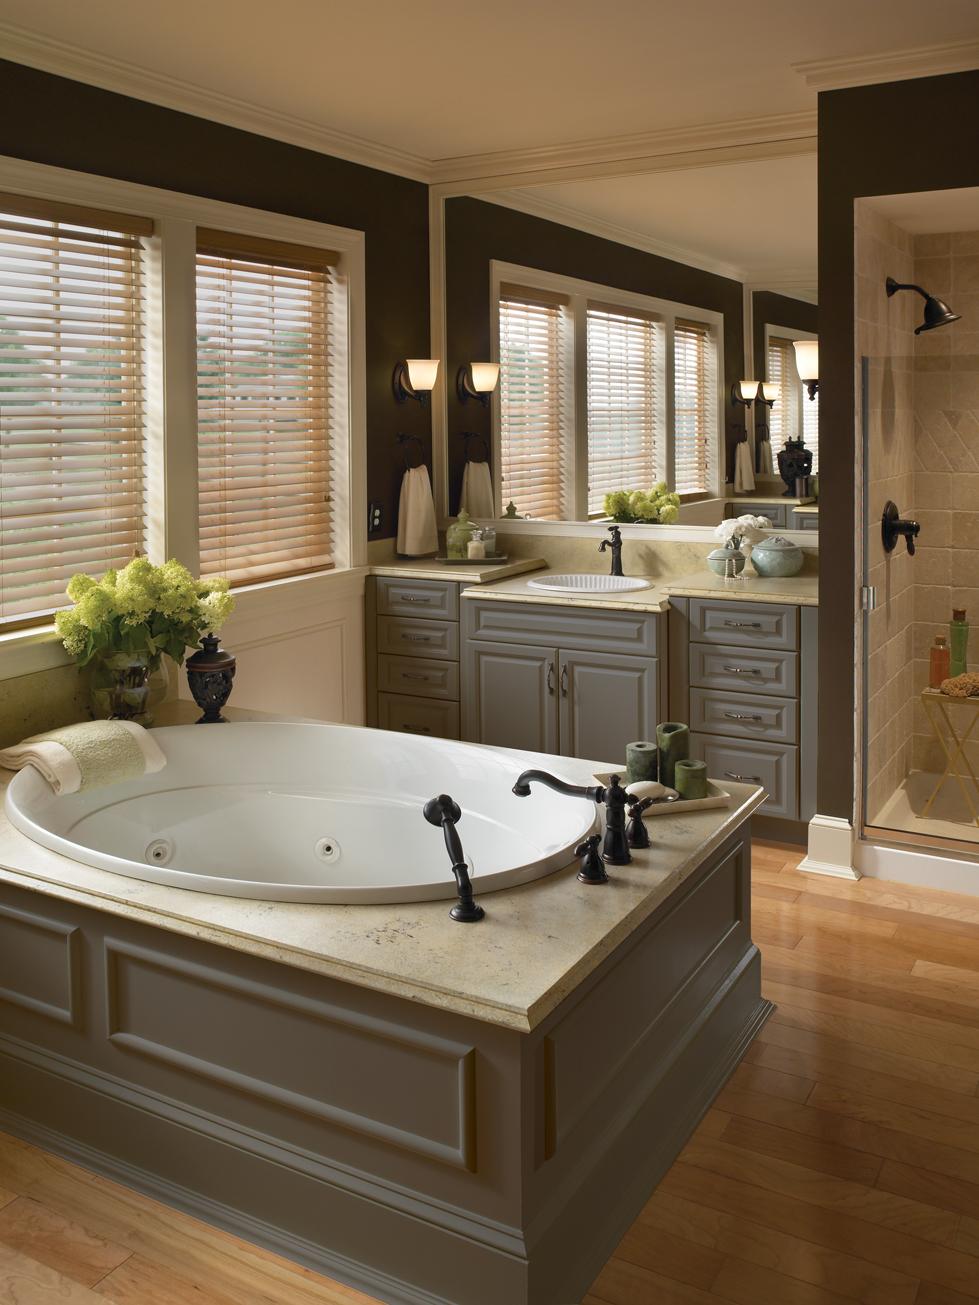 Bathroom Cabinets Tulsa Wall Richmond Va To Design Decorating